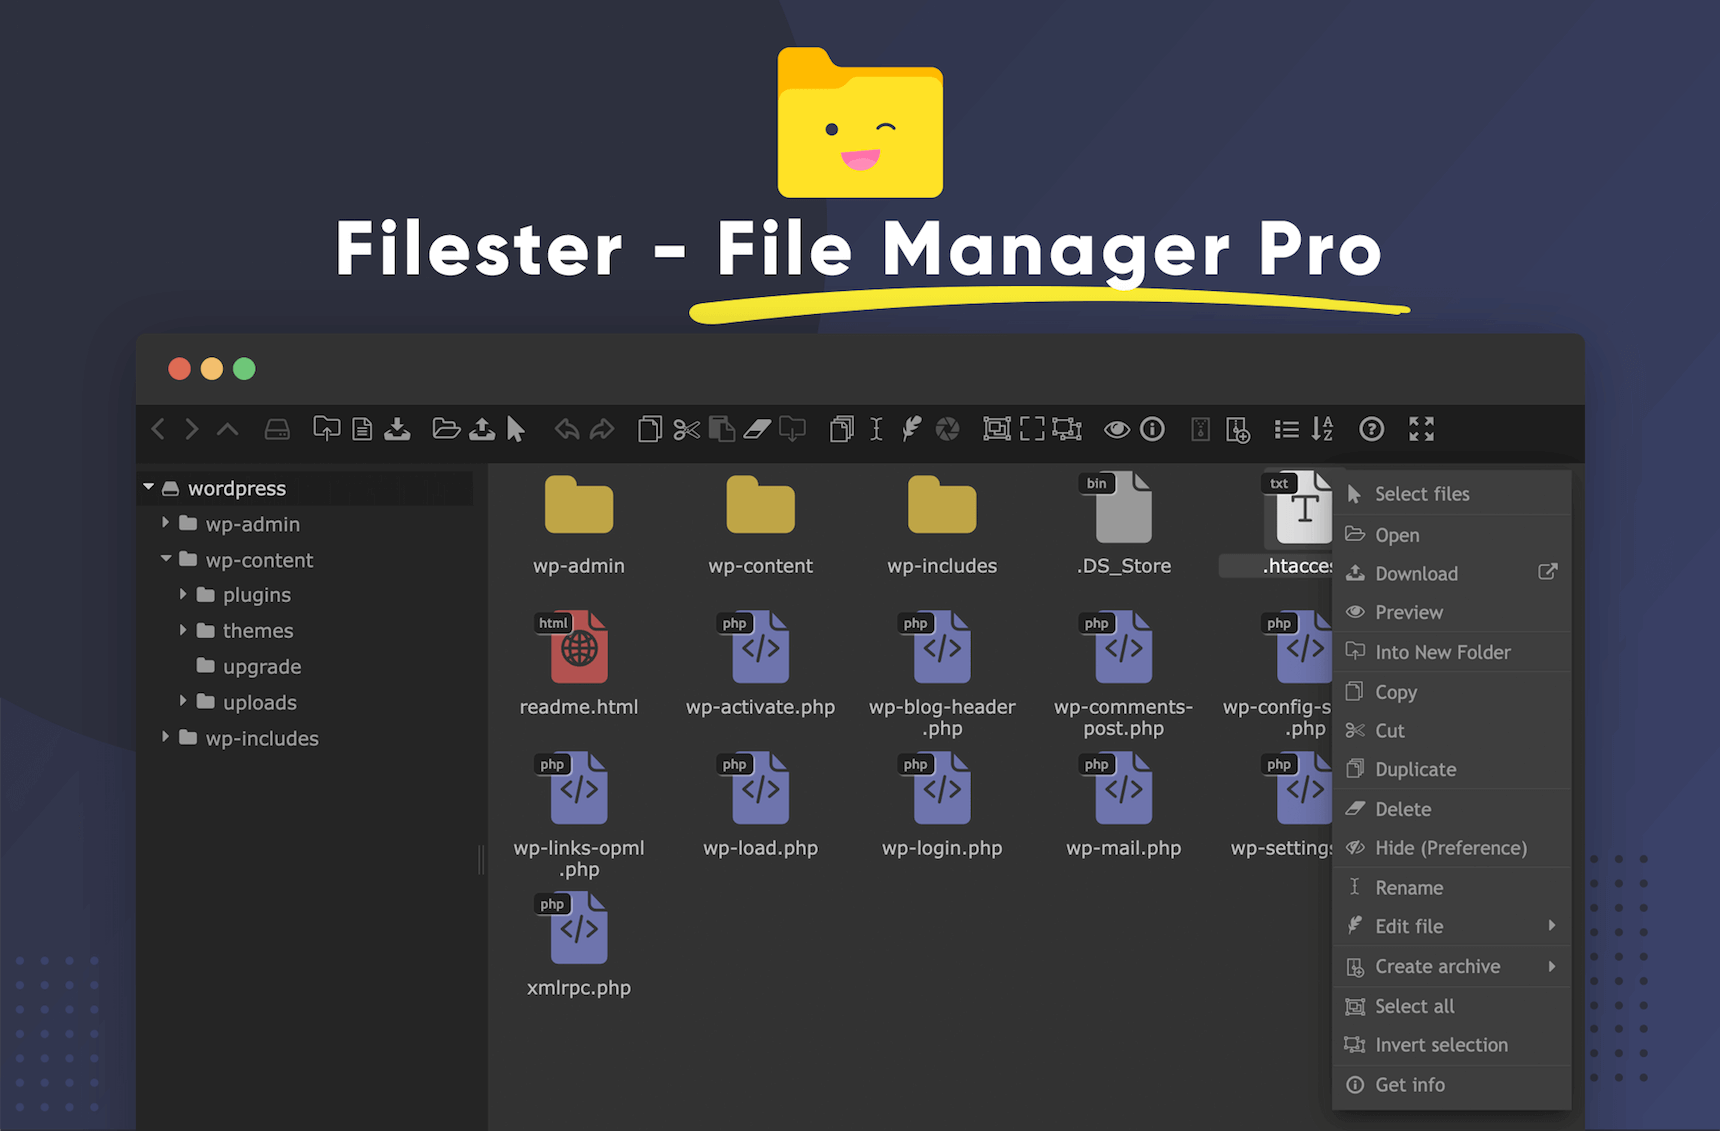 Filester WordPress File Manager